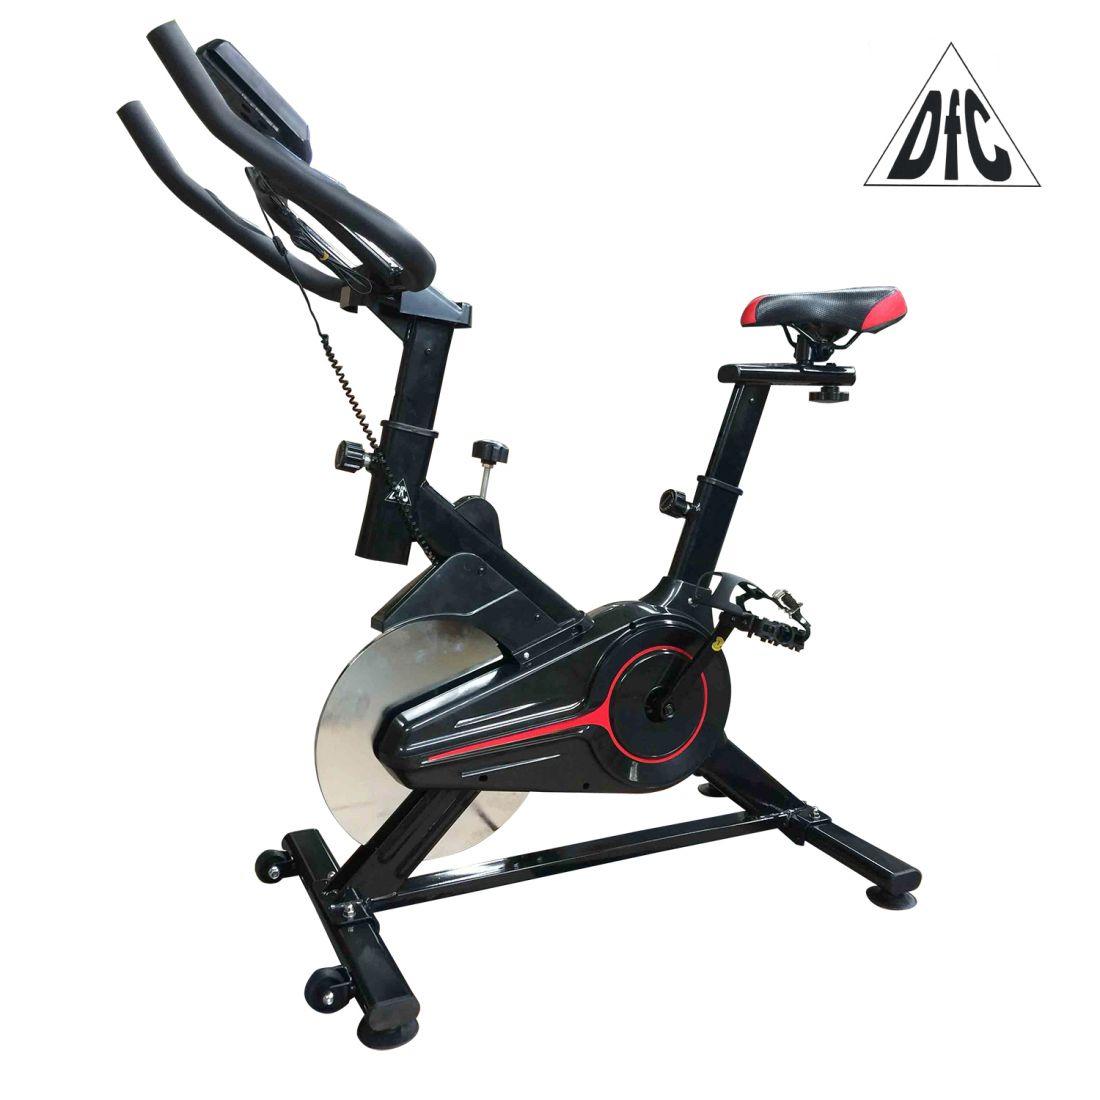 Спин-байк (велотренажер) - DFC B3301